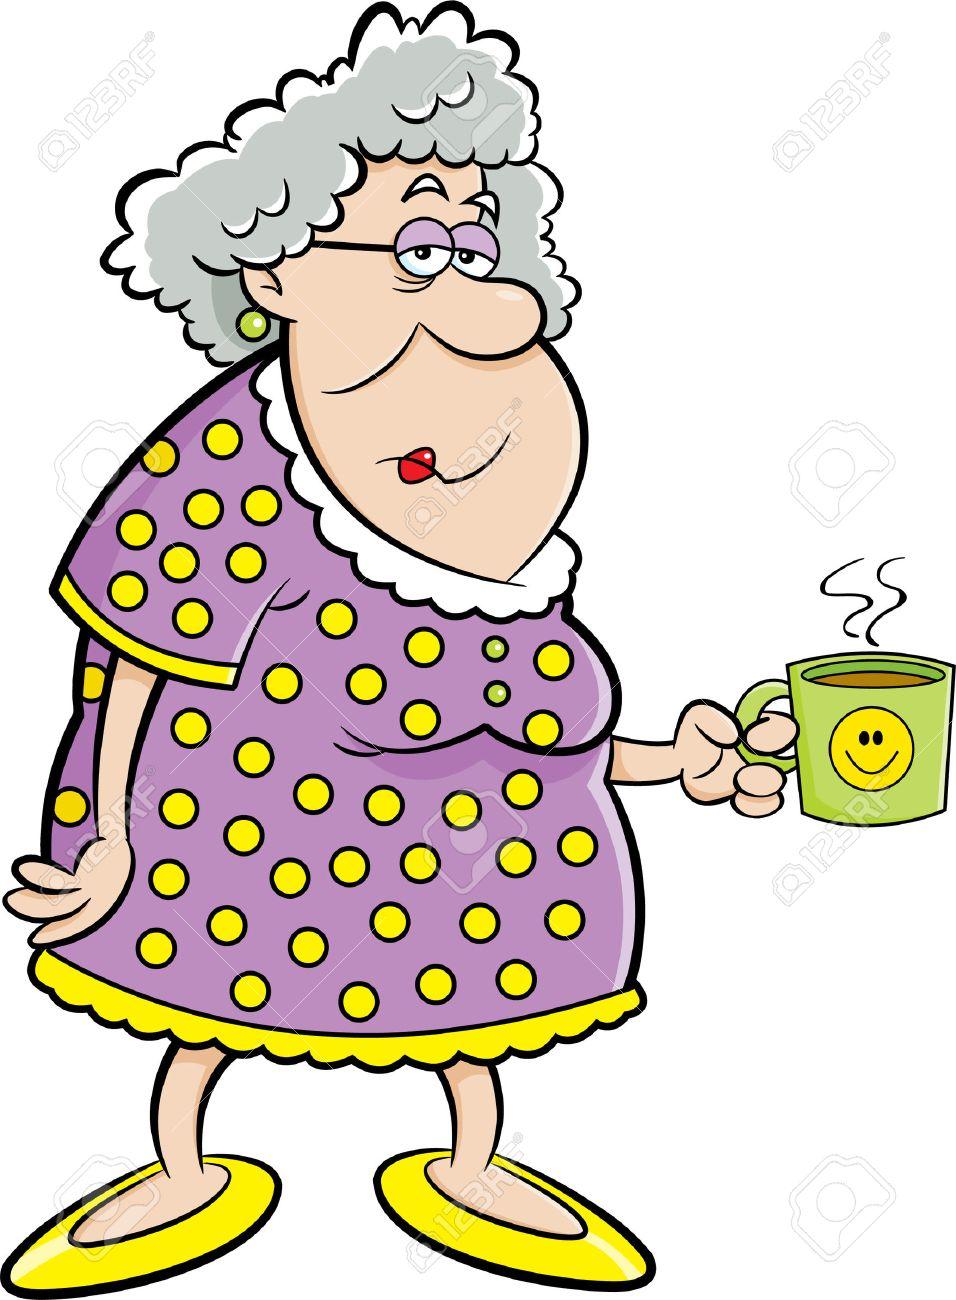 Cartoon illustration of an old lady holding a coffee mug. - 49801904